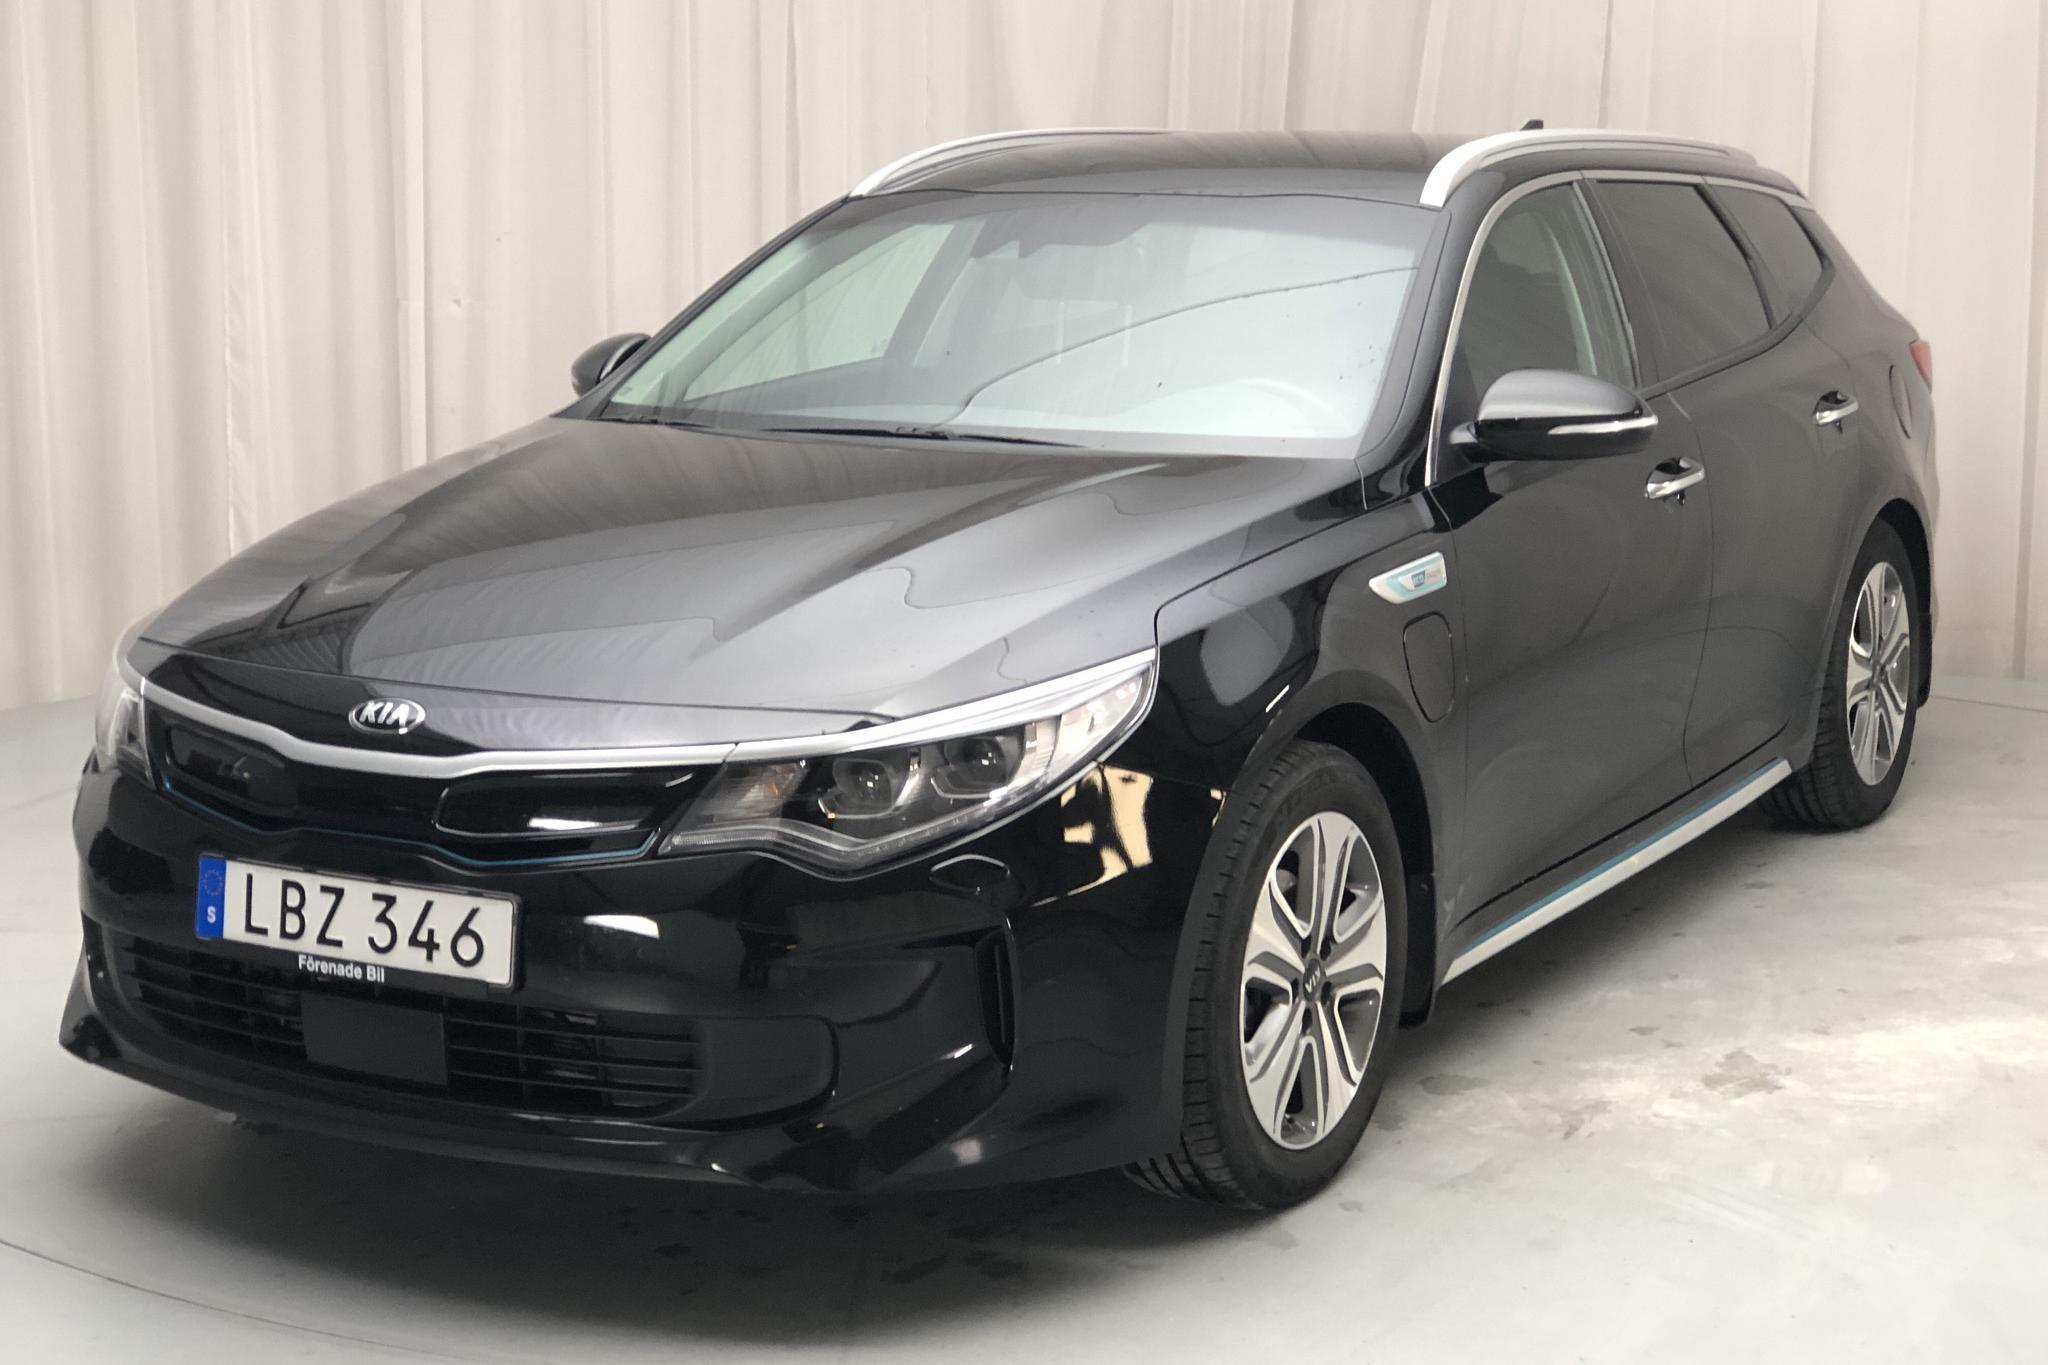 KIA Optima 2.0 GDi Plug-in Hybrid SW (205hk) - 4 943 mil - Automat - svart - 2018